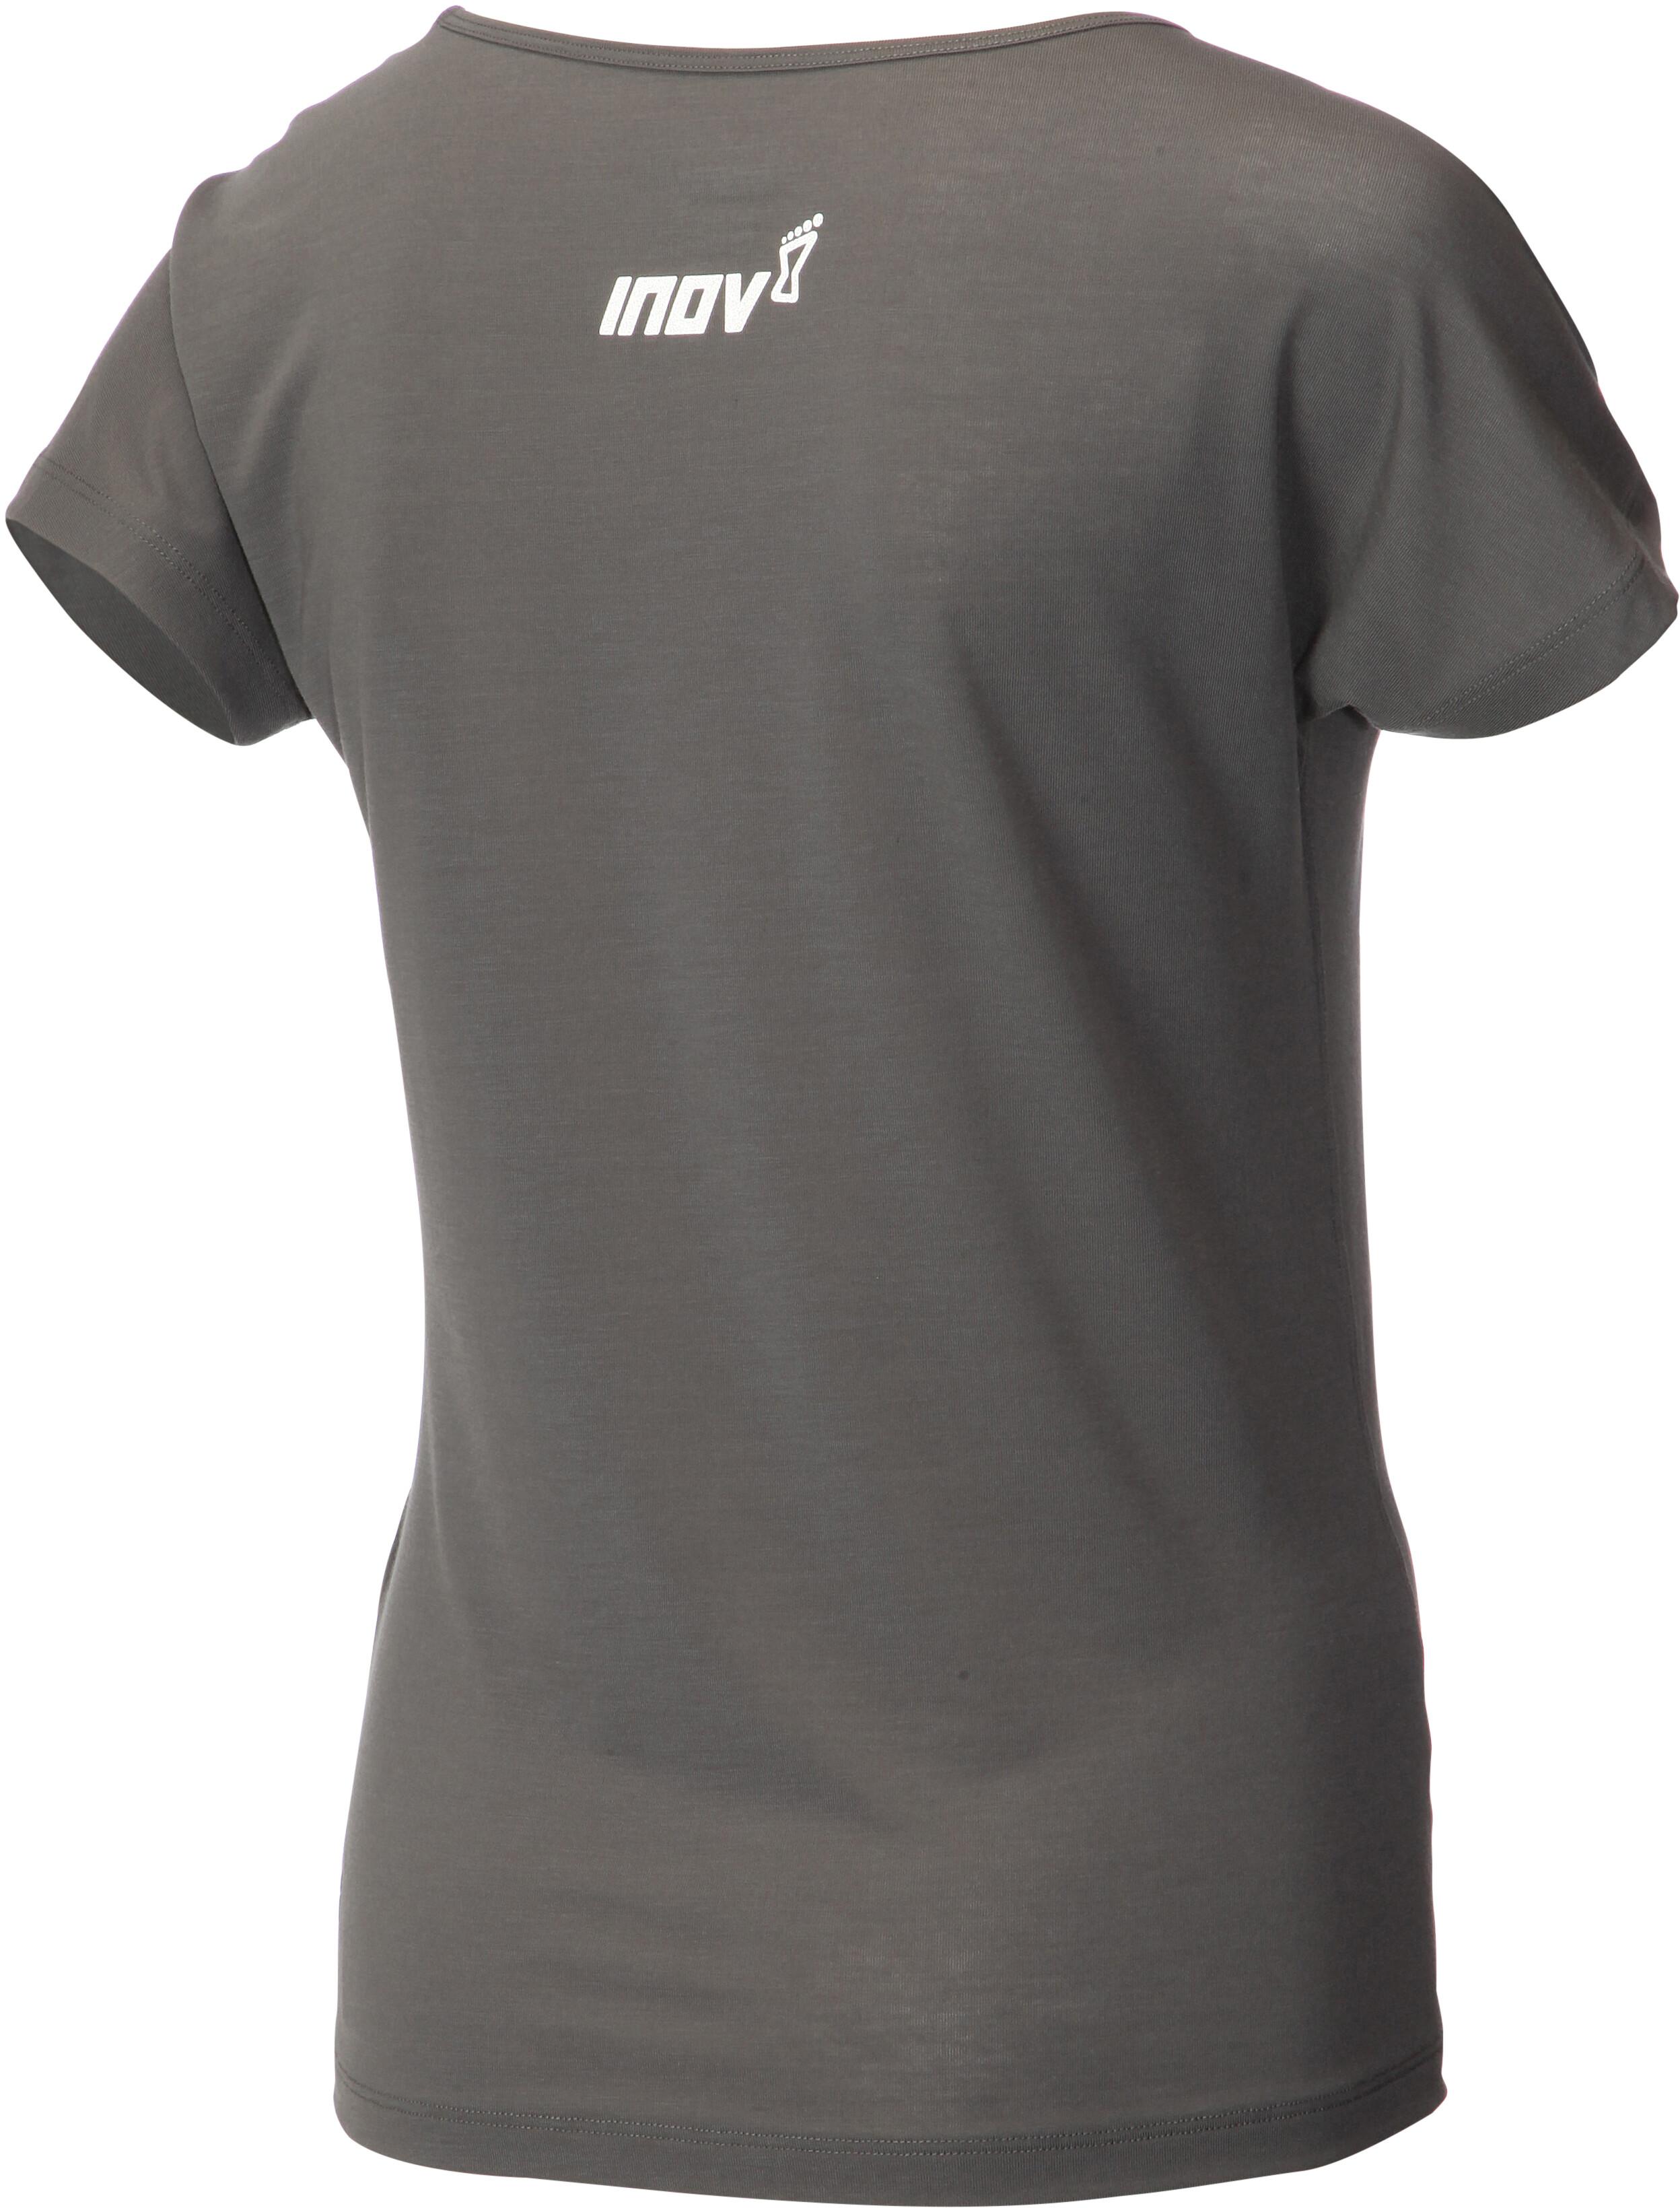 online retailer 884f3 b986a inov-8 AT C Dri Release - T-shirt course à pied Femme